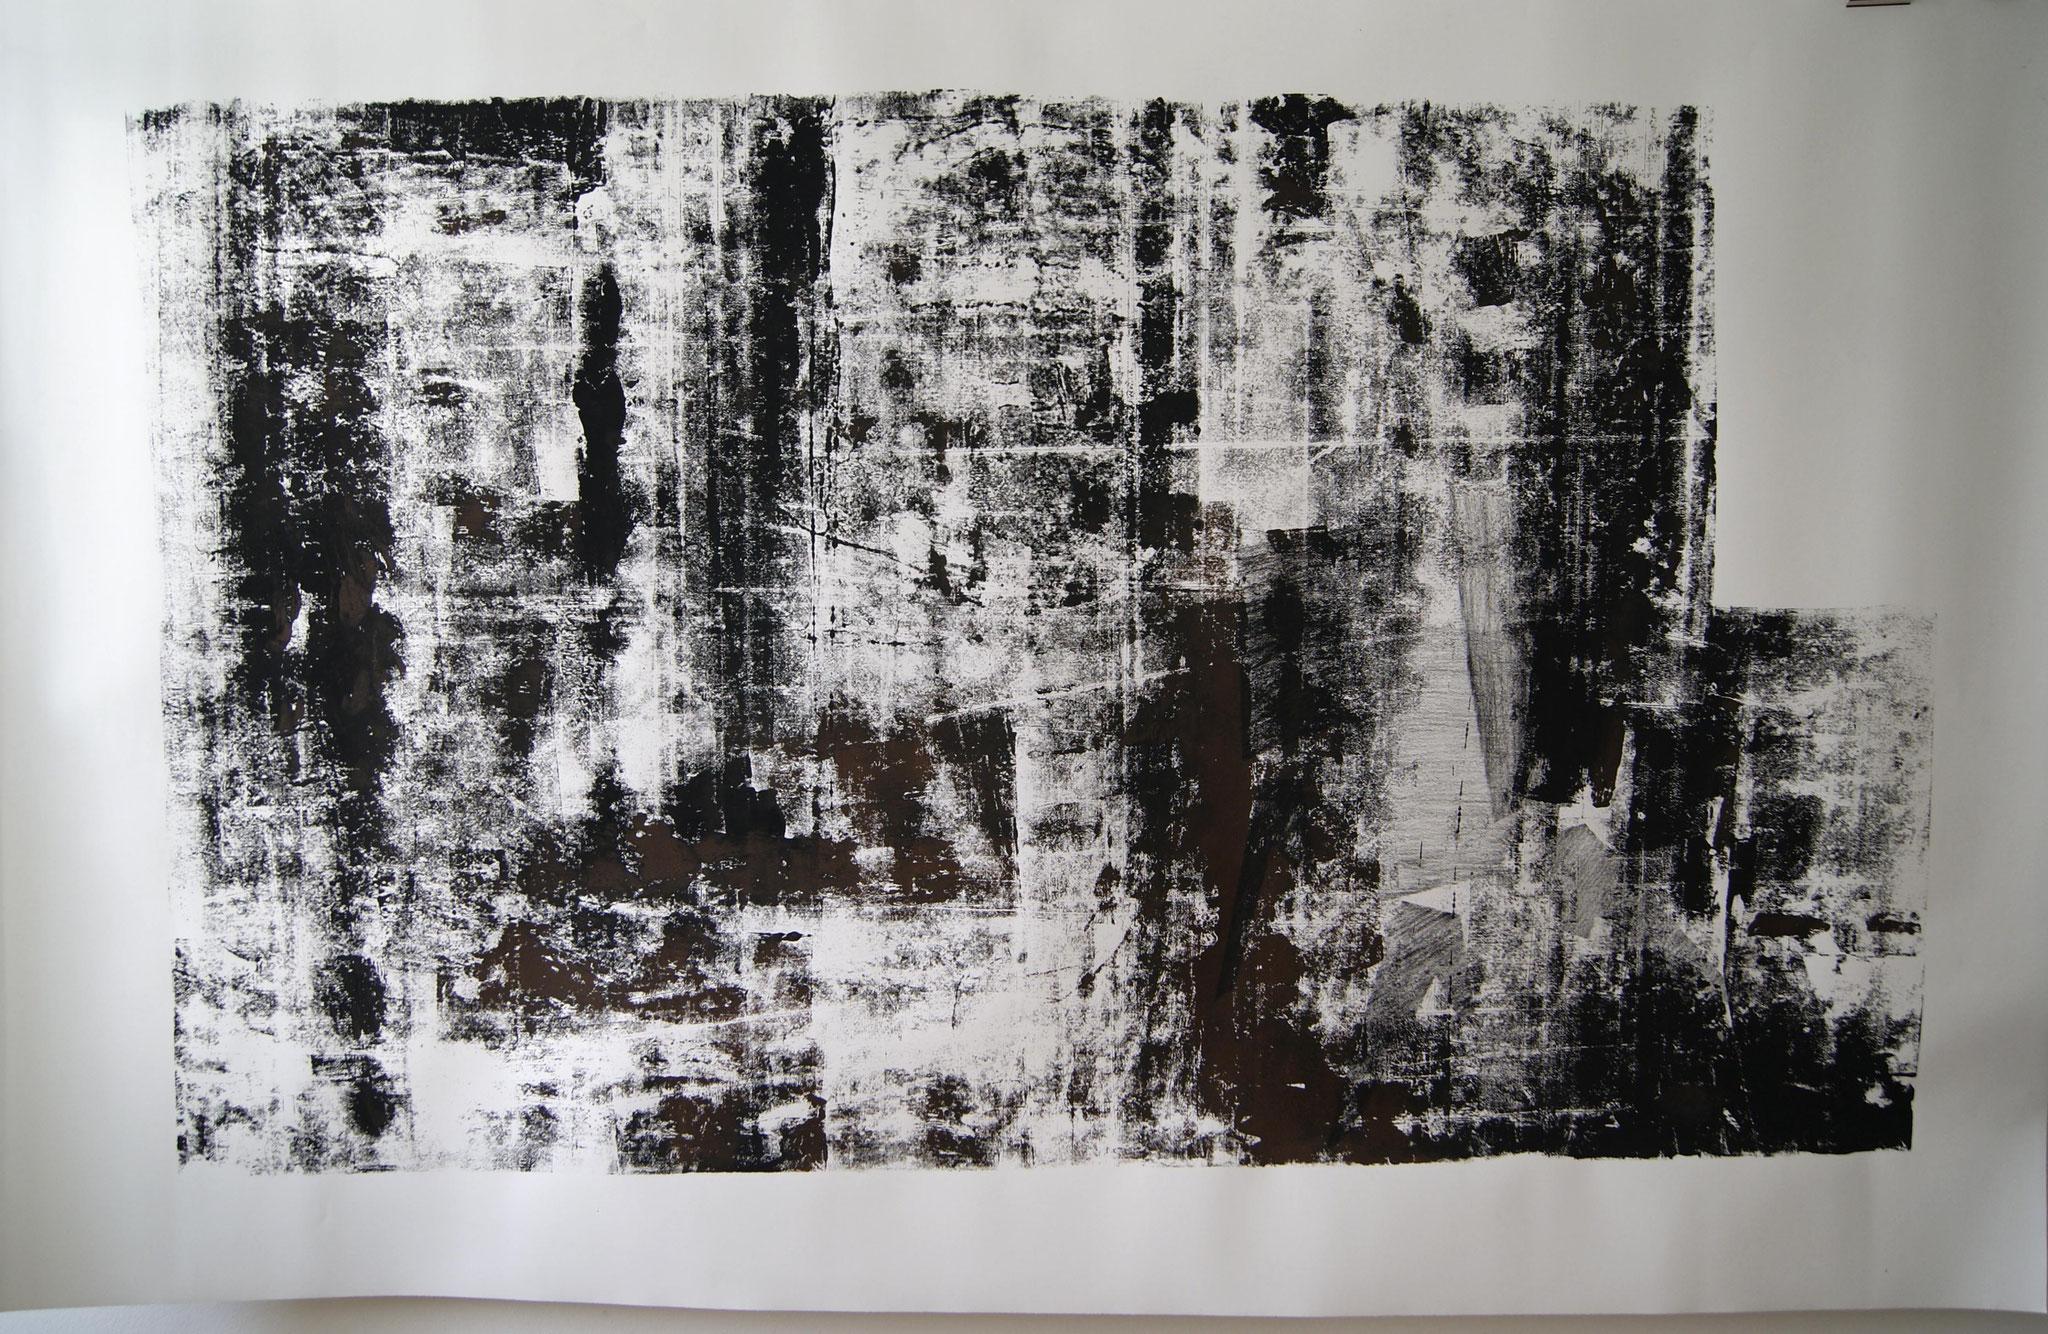 o.T. III, 2017, 250 x 150cm linolprint